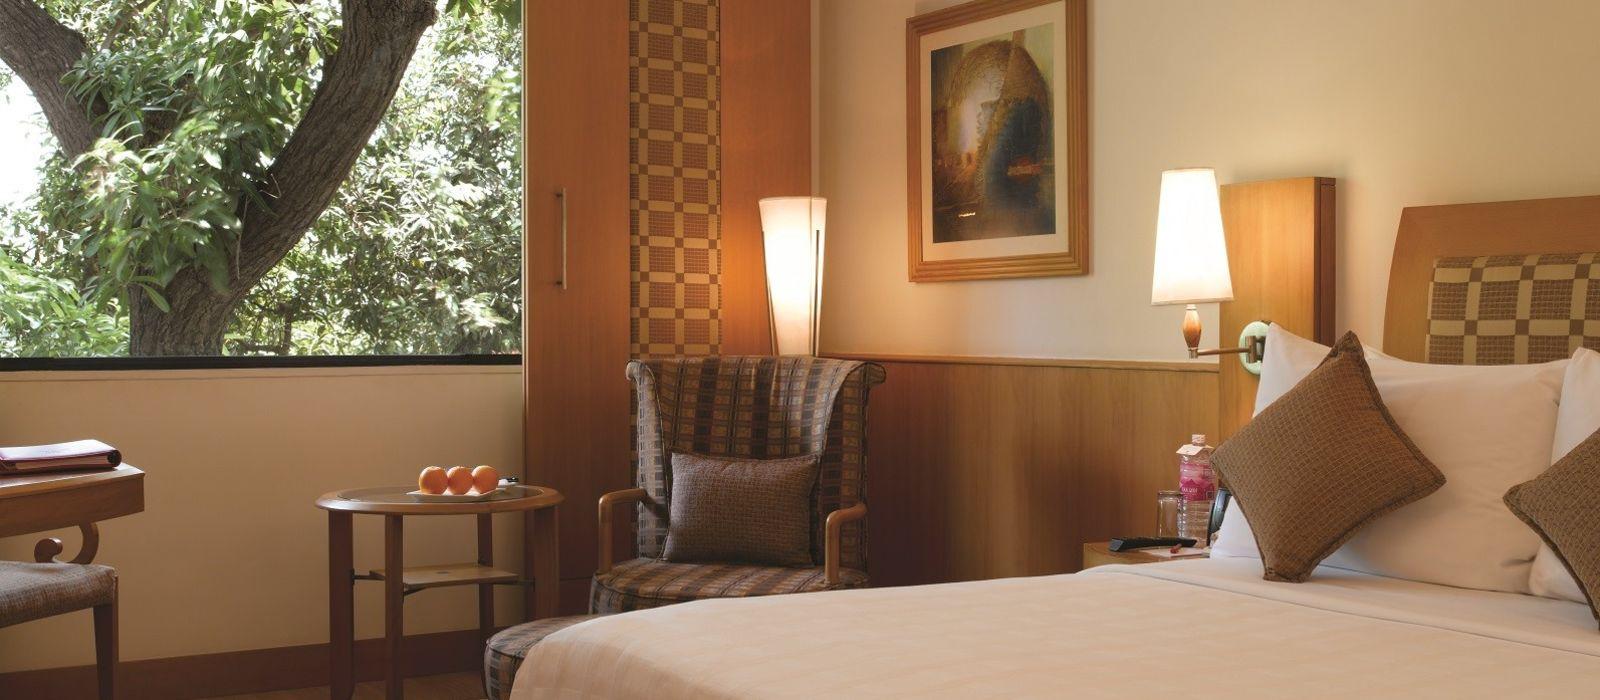 Hotel The Trident Chennai South India